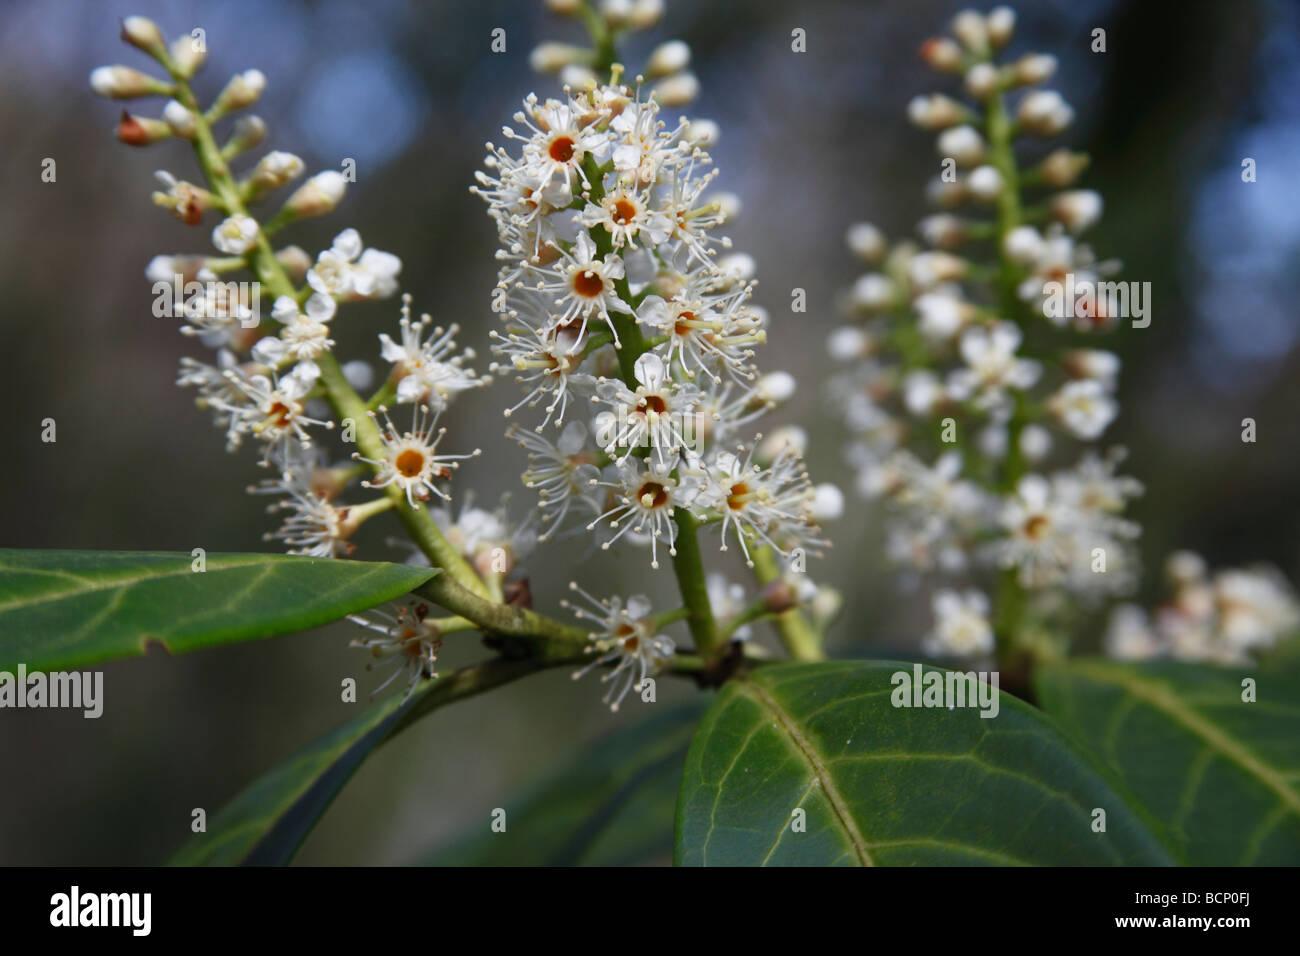 Lorbeer Prunus Laurocerasus Blume Spitzen Nahaufnahme Stockbild